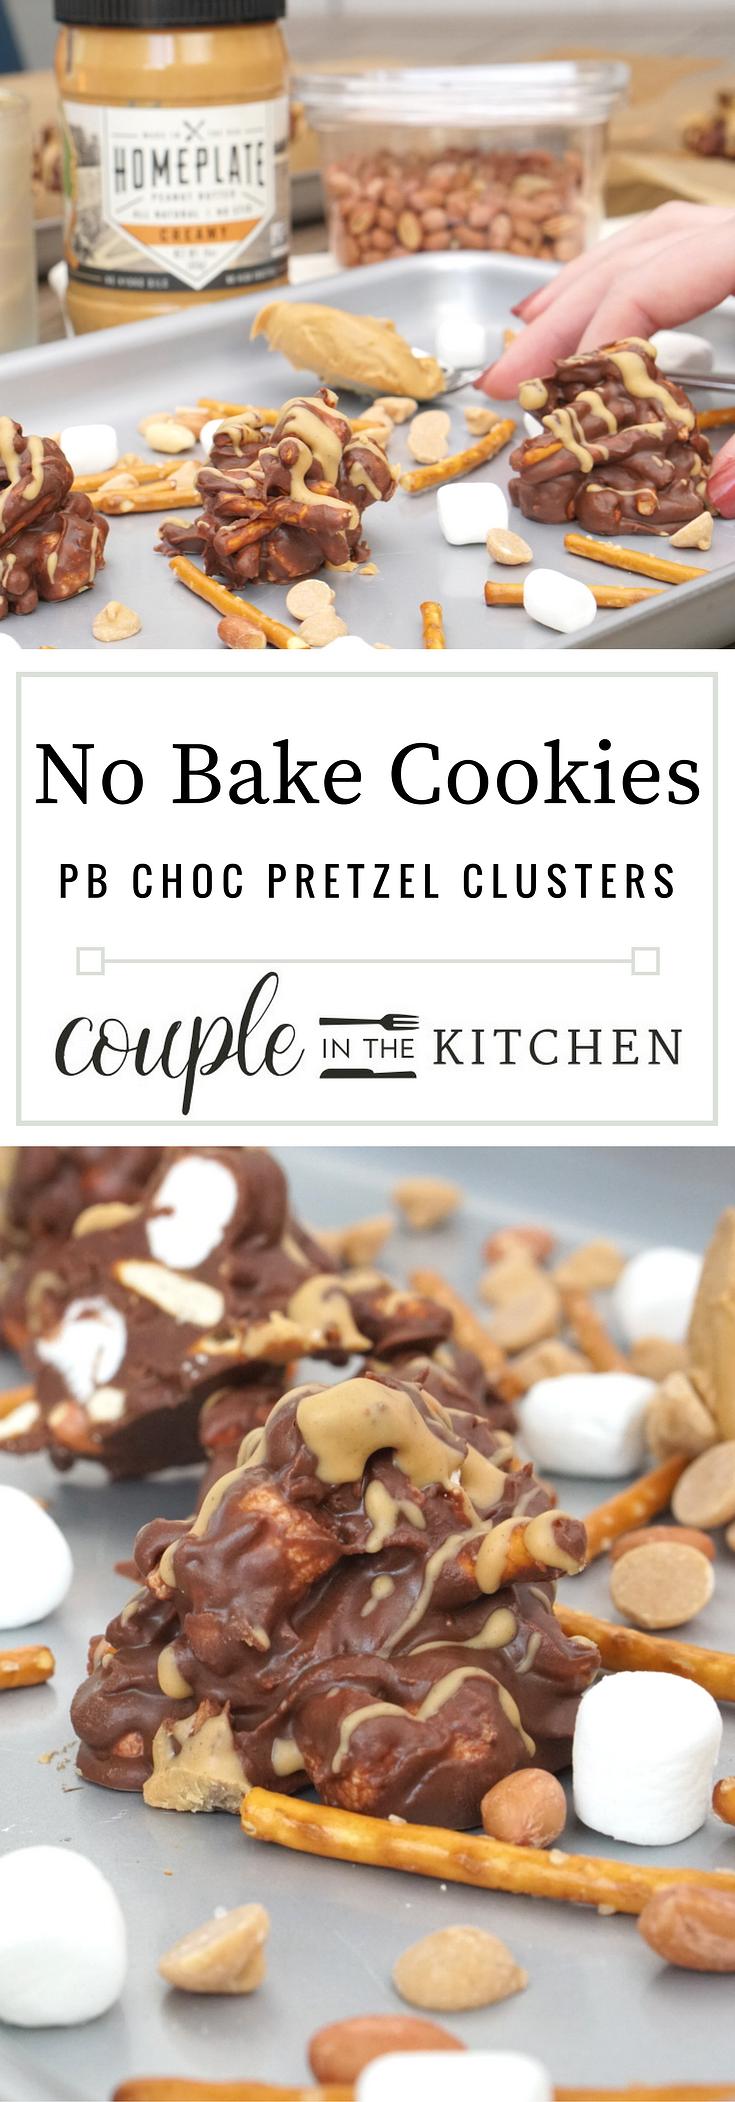 No Bake Cookies - Peanut Butter Chocolate Pretzel Clusters | coupleinthekitchen.com